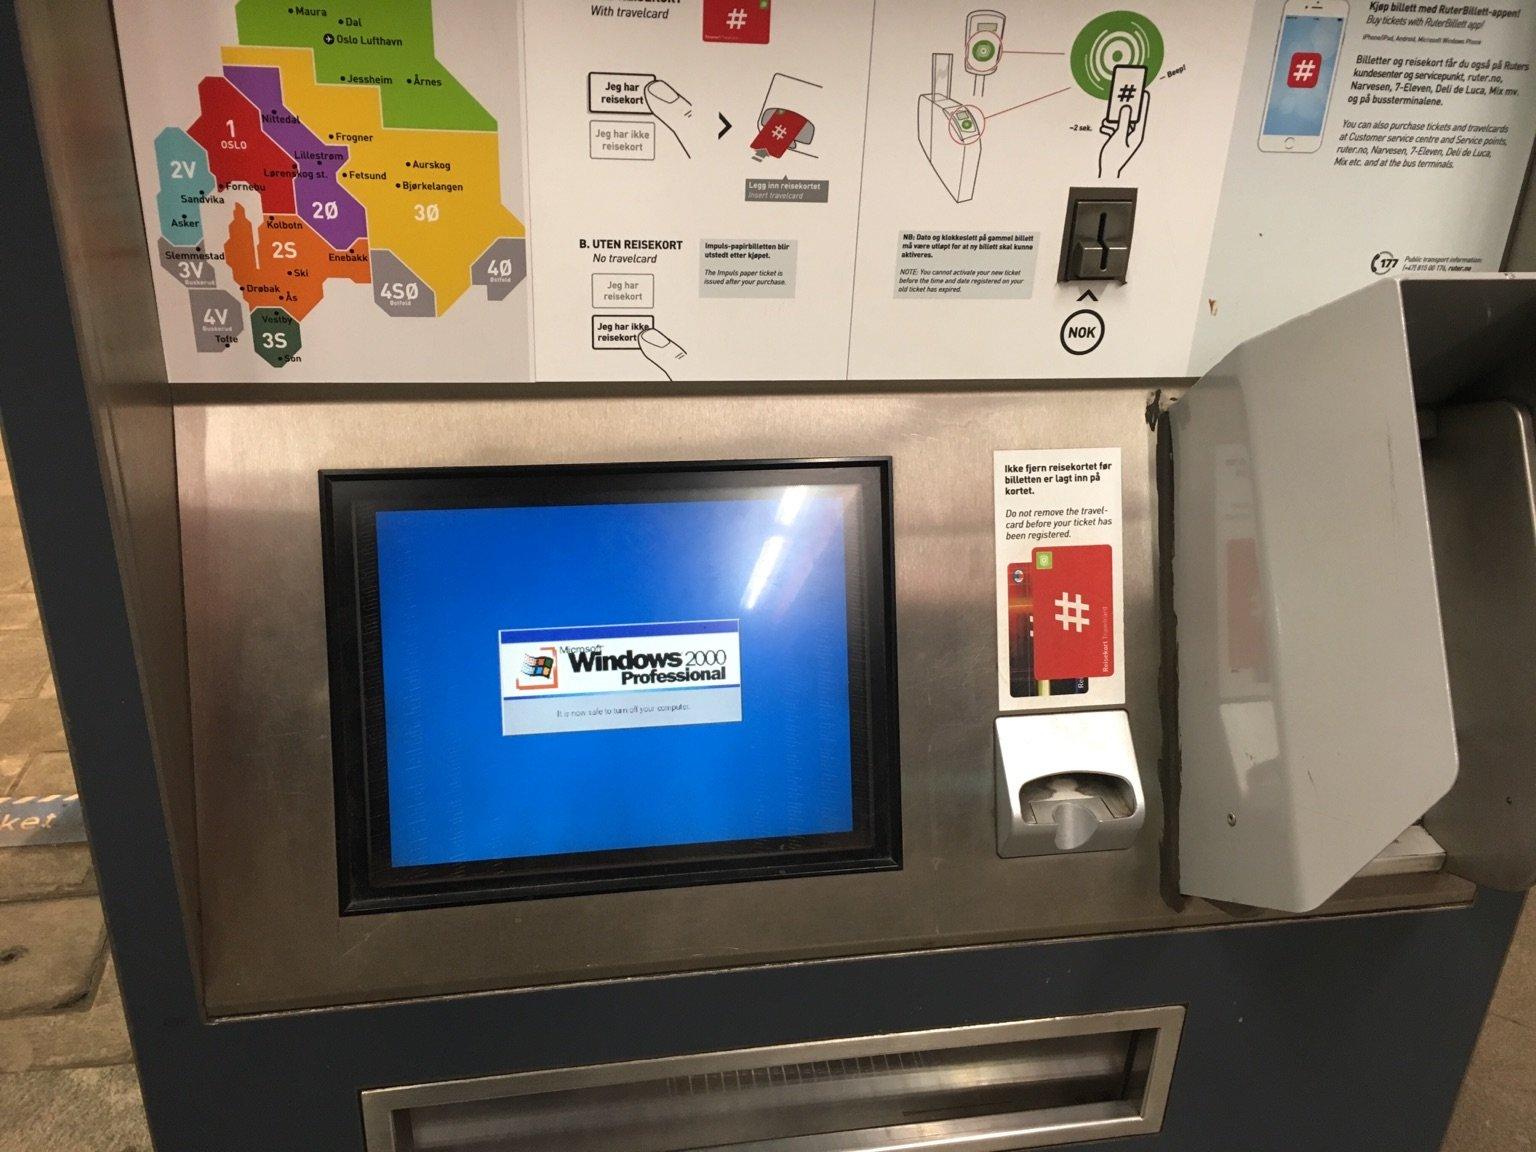 [Bilde av Ruters billettautomat med Windows 2000-feilmelding]